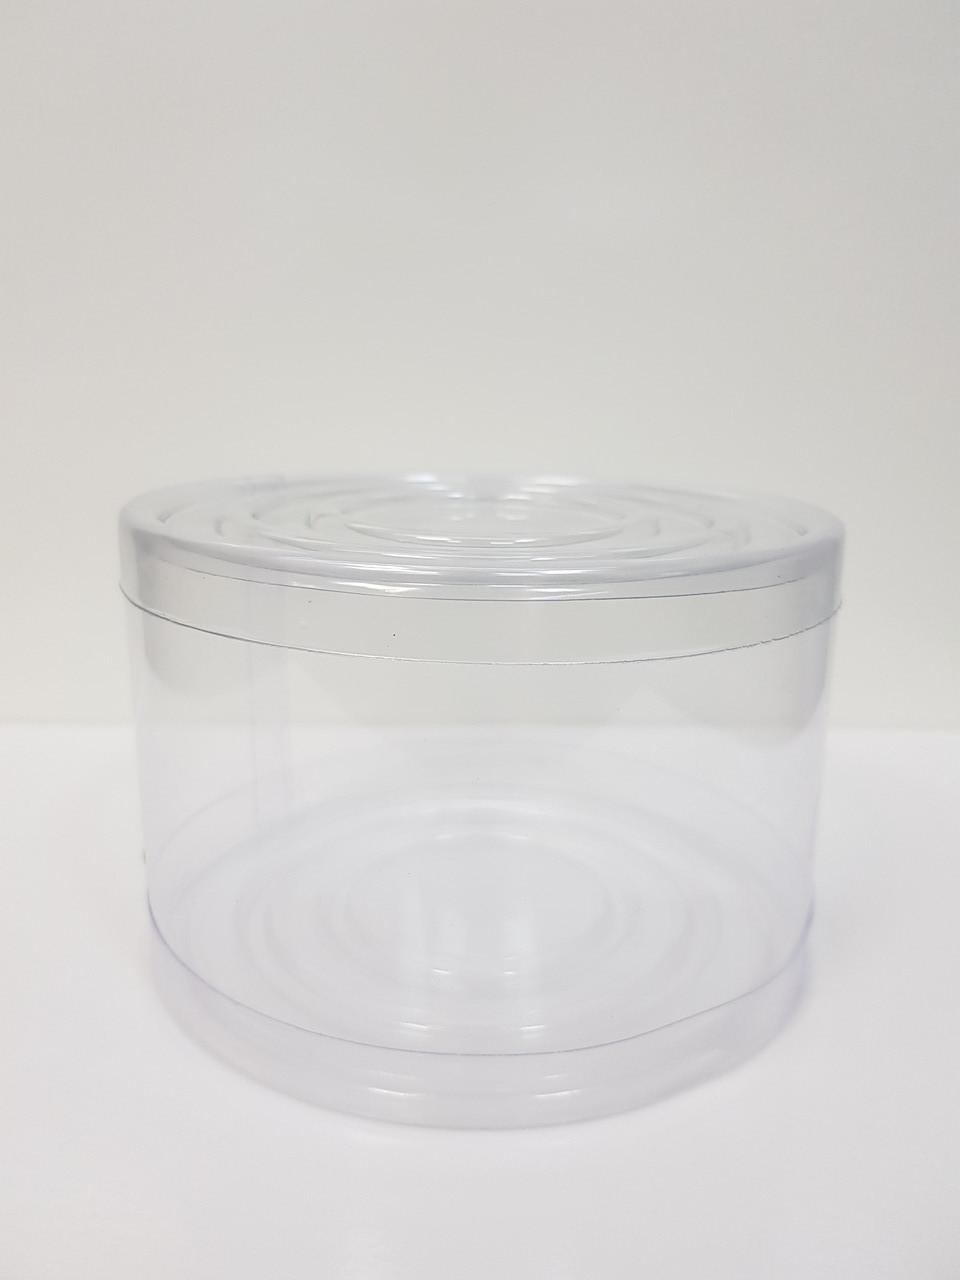 Упаковка(тубус)  Галетте - 04047